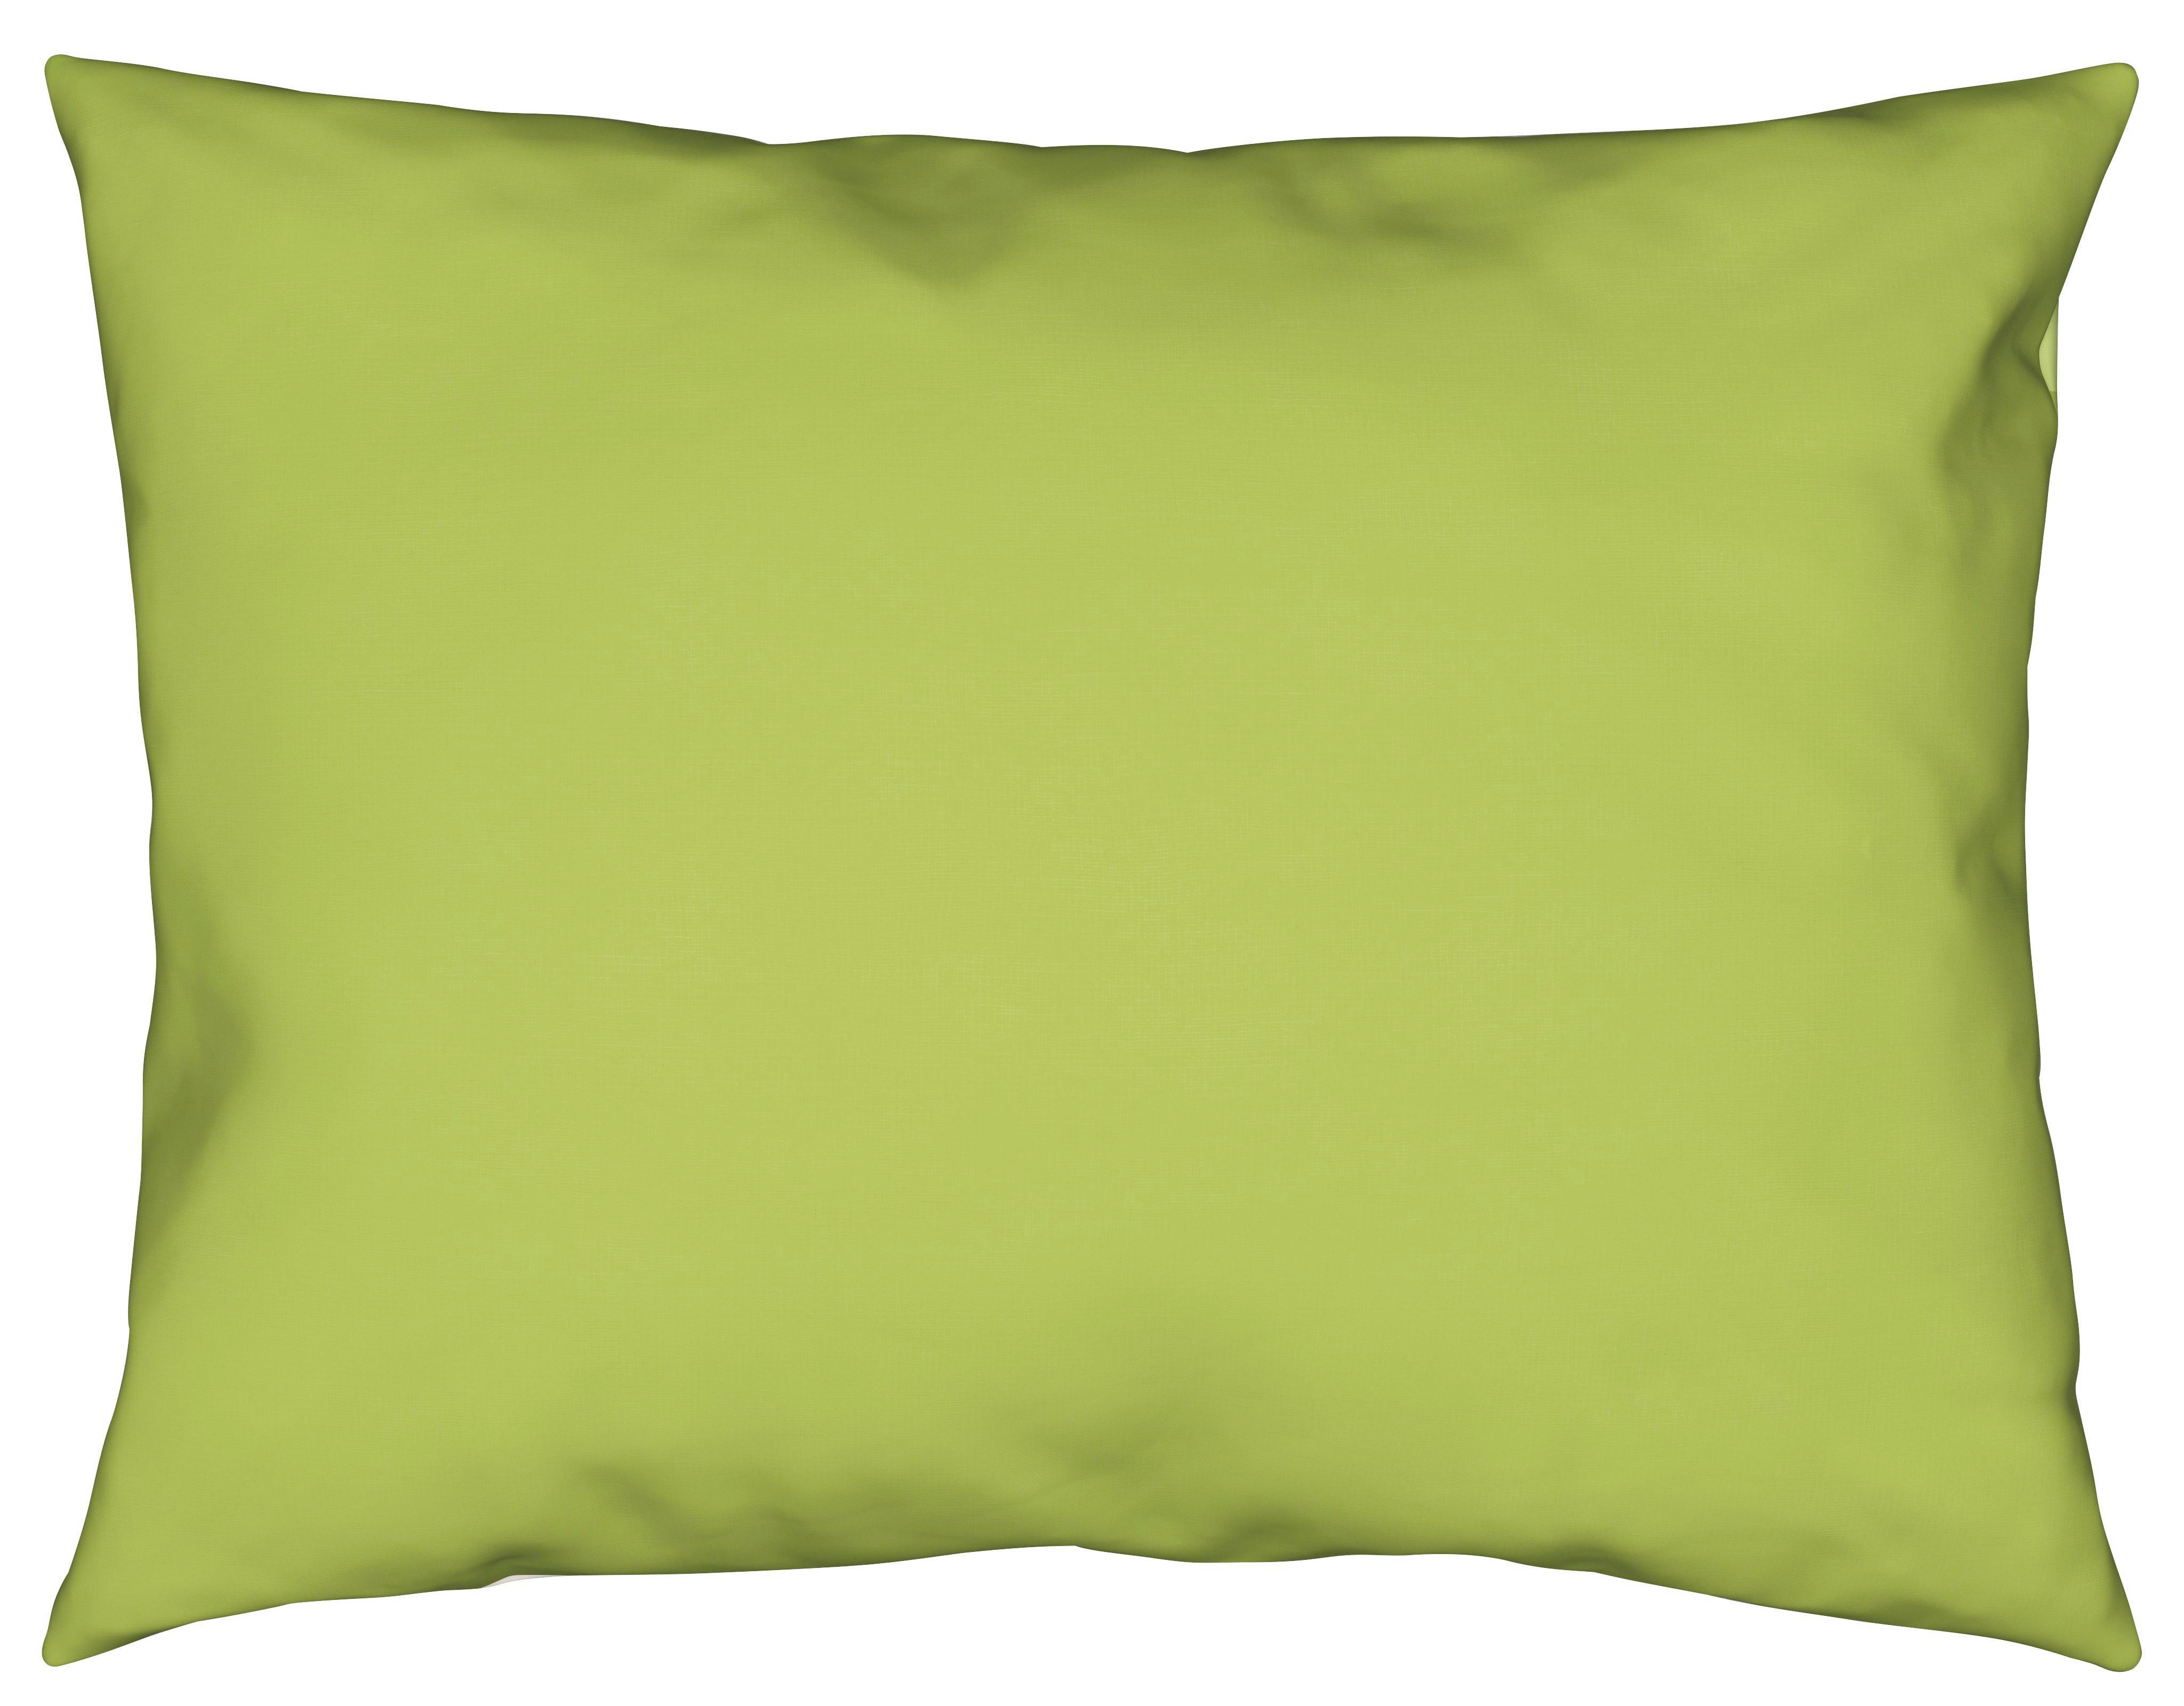 BETTWÄSCHE 140/200 cm - Hellgrün, Design, Textil (140/200cm) - ESPOSA